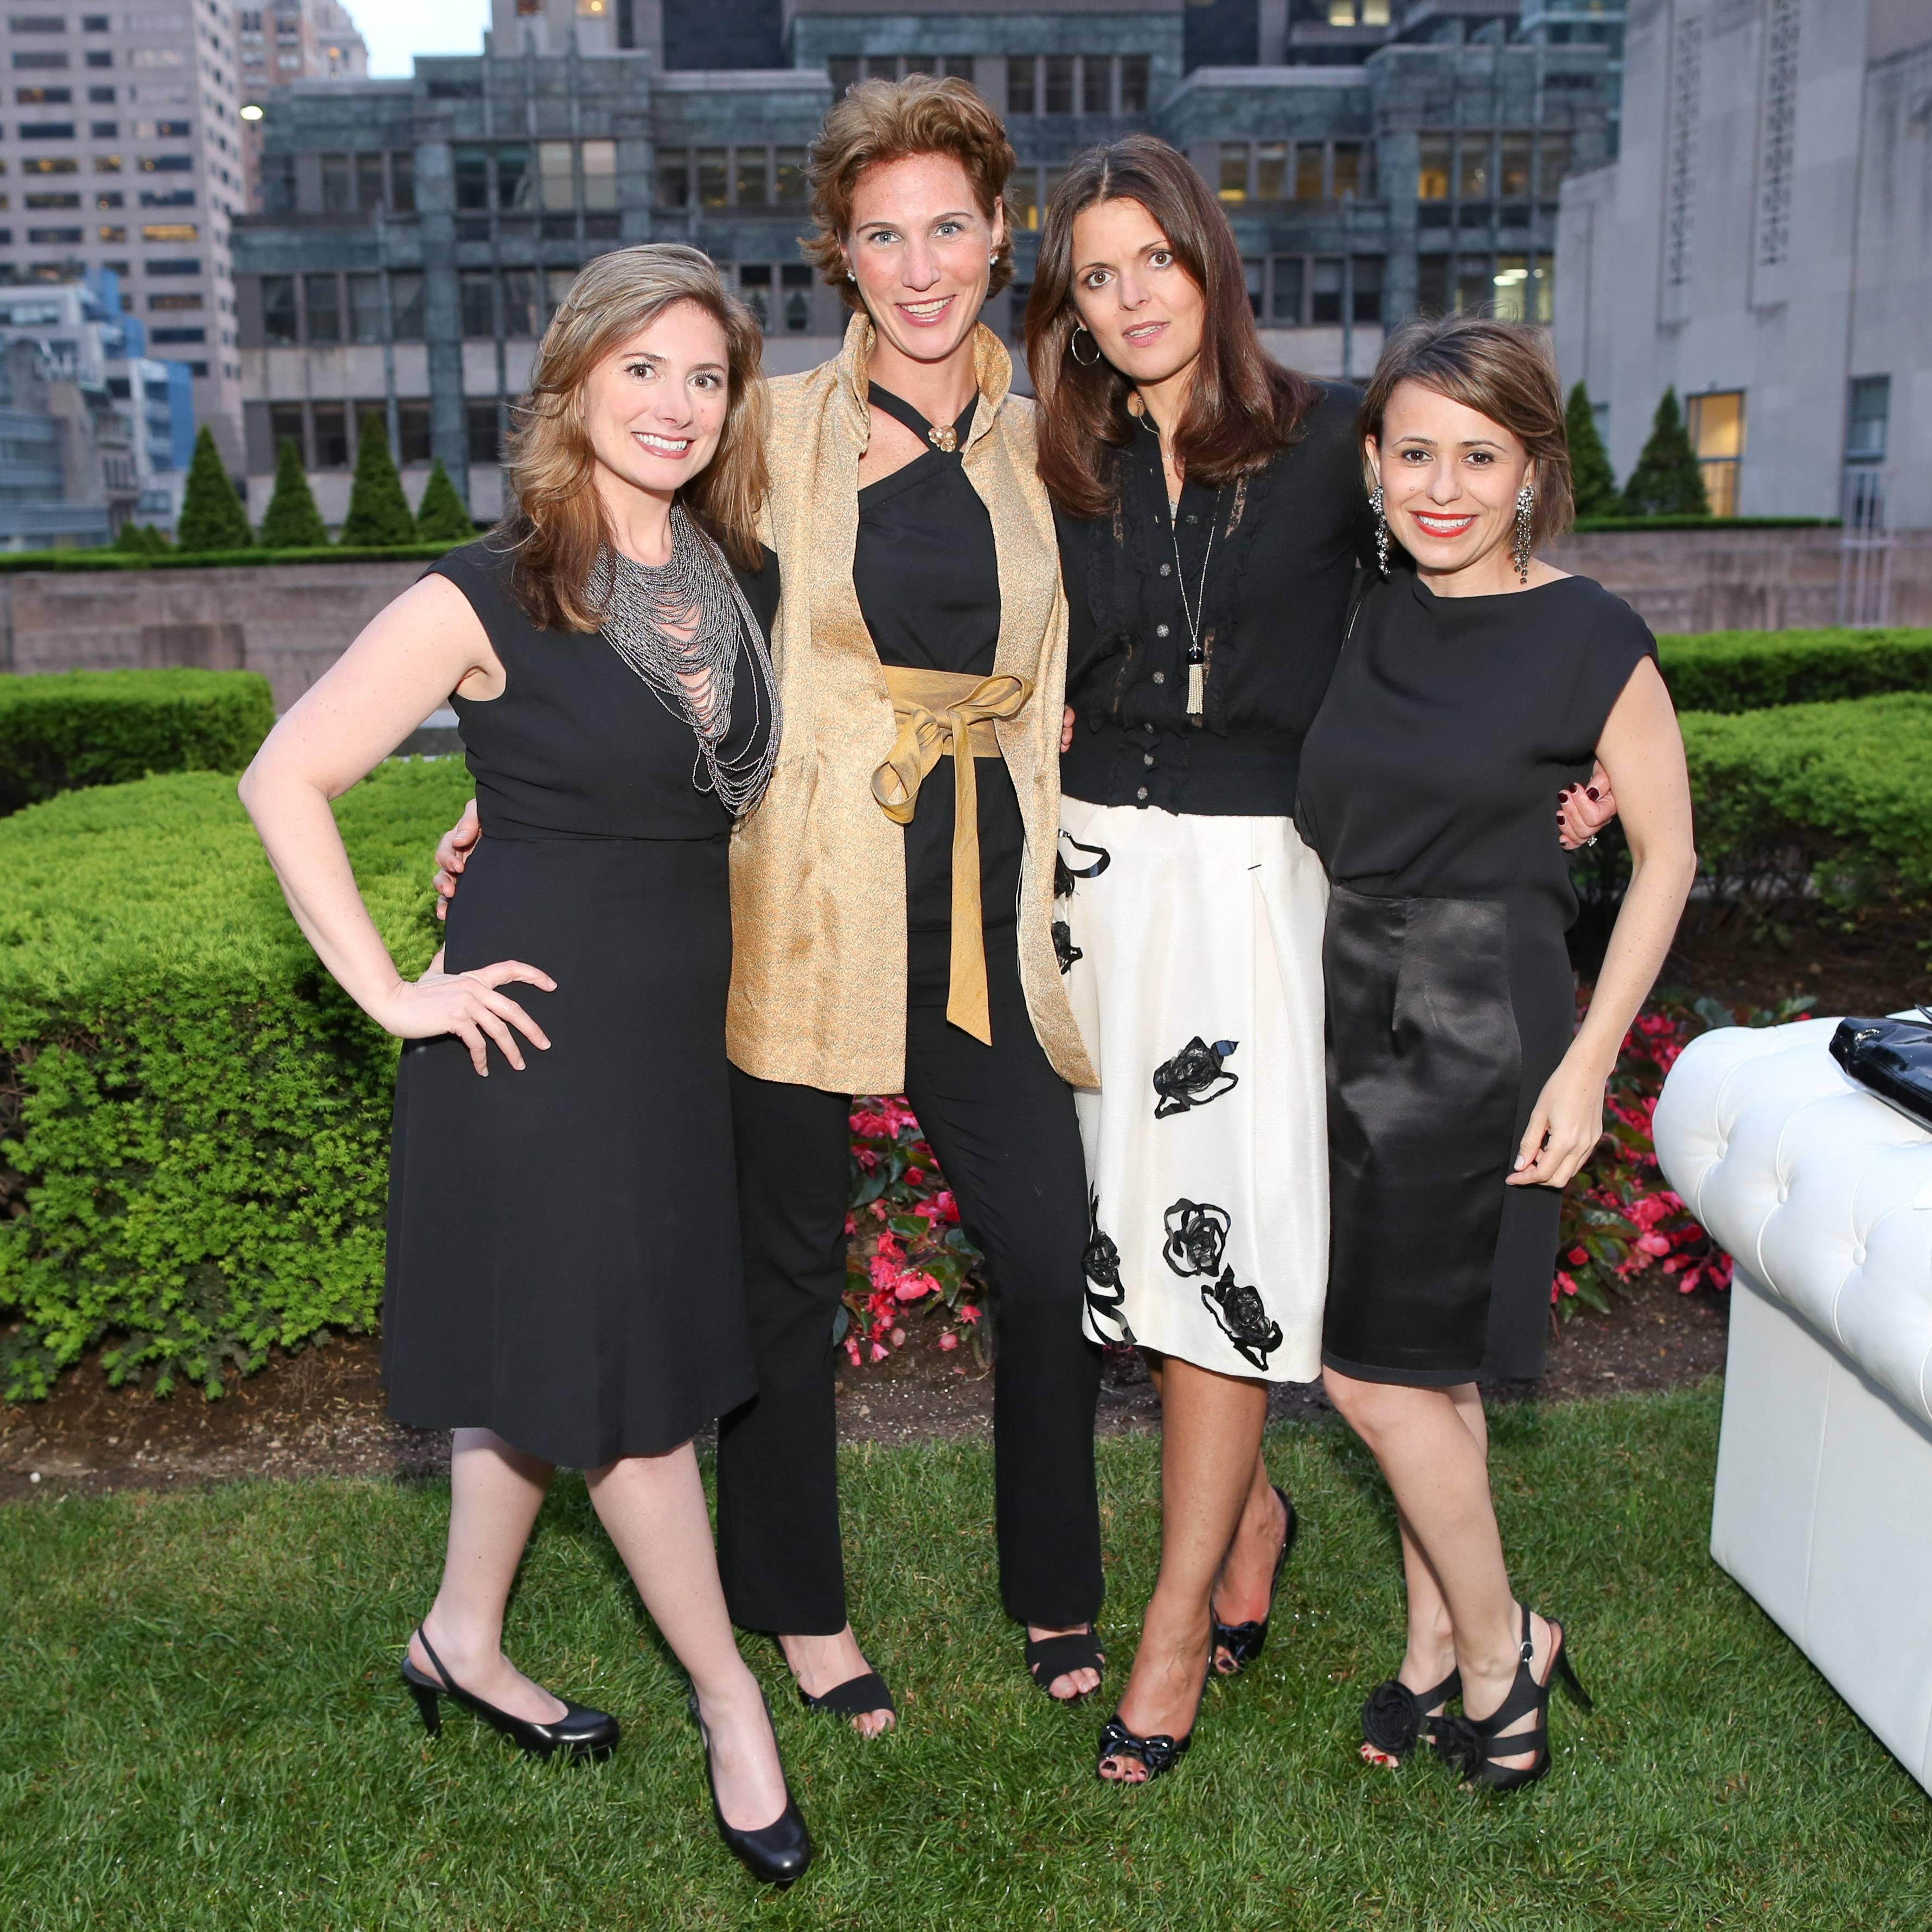 MV4C4282 Gwen Harper, Jennifer Sprague, Zoe Kimber, Gwen Thayer